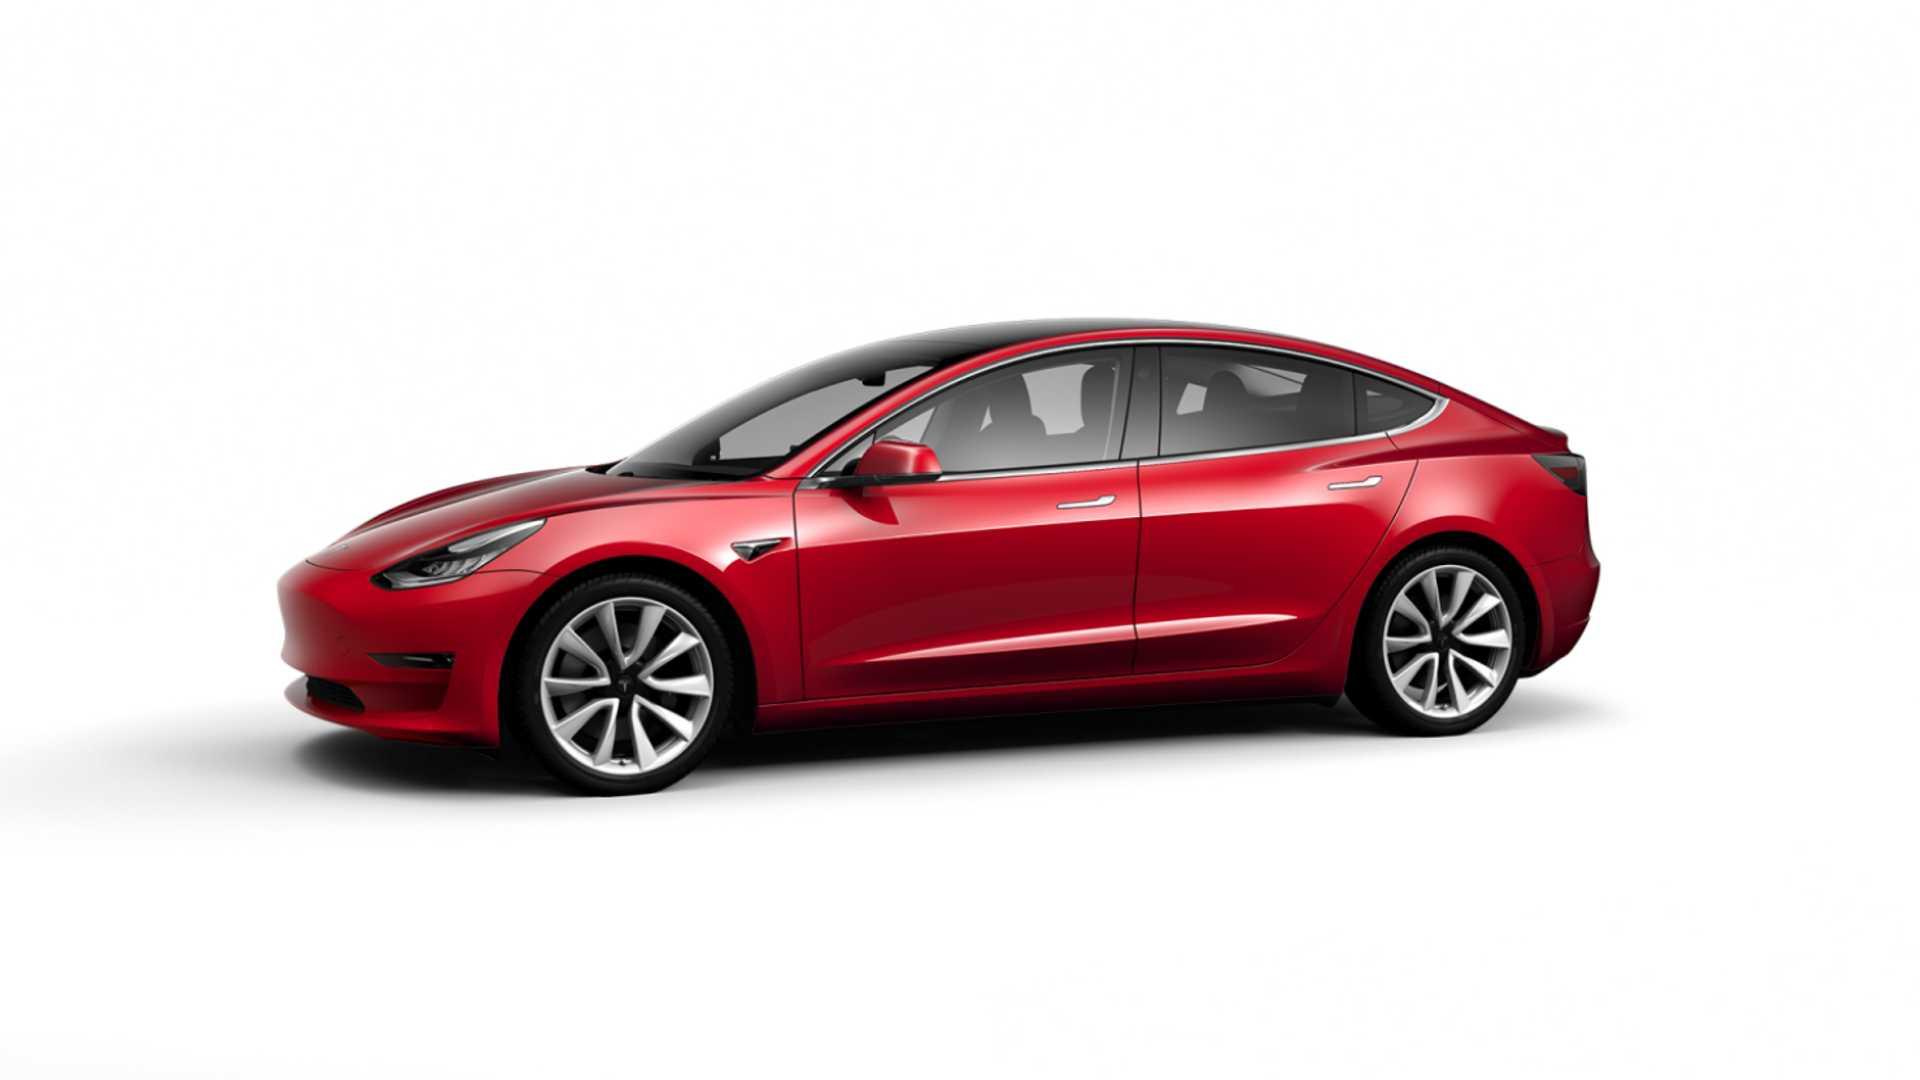 В апреле Tesla получила около 15 000 заказов на MIC Model 3 LR